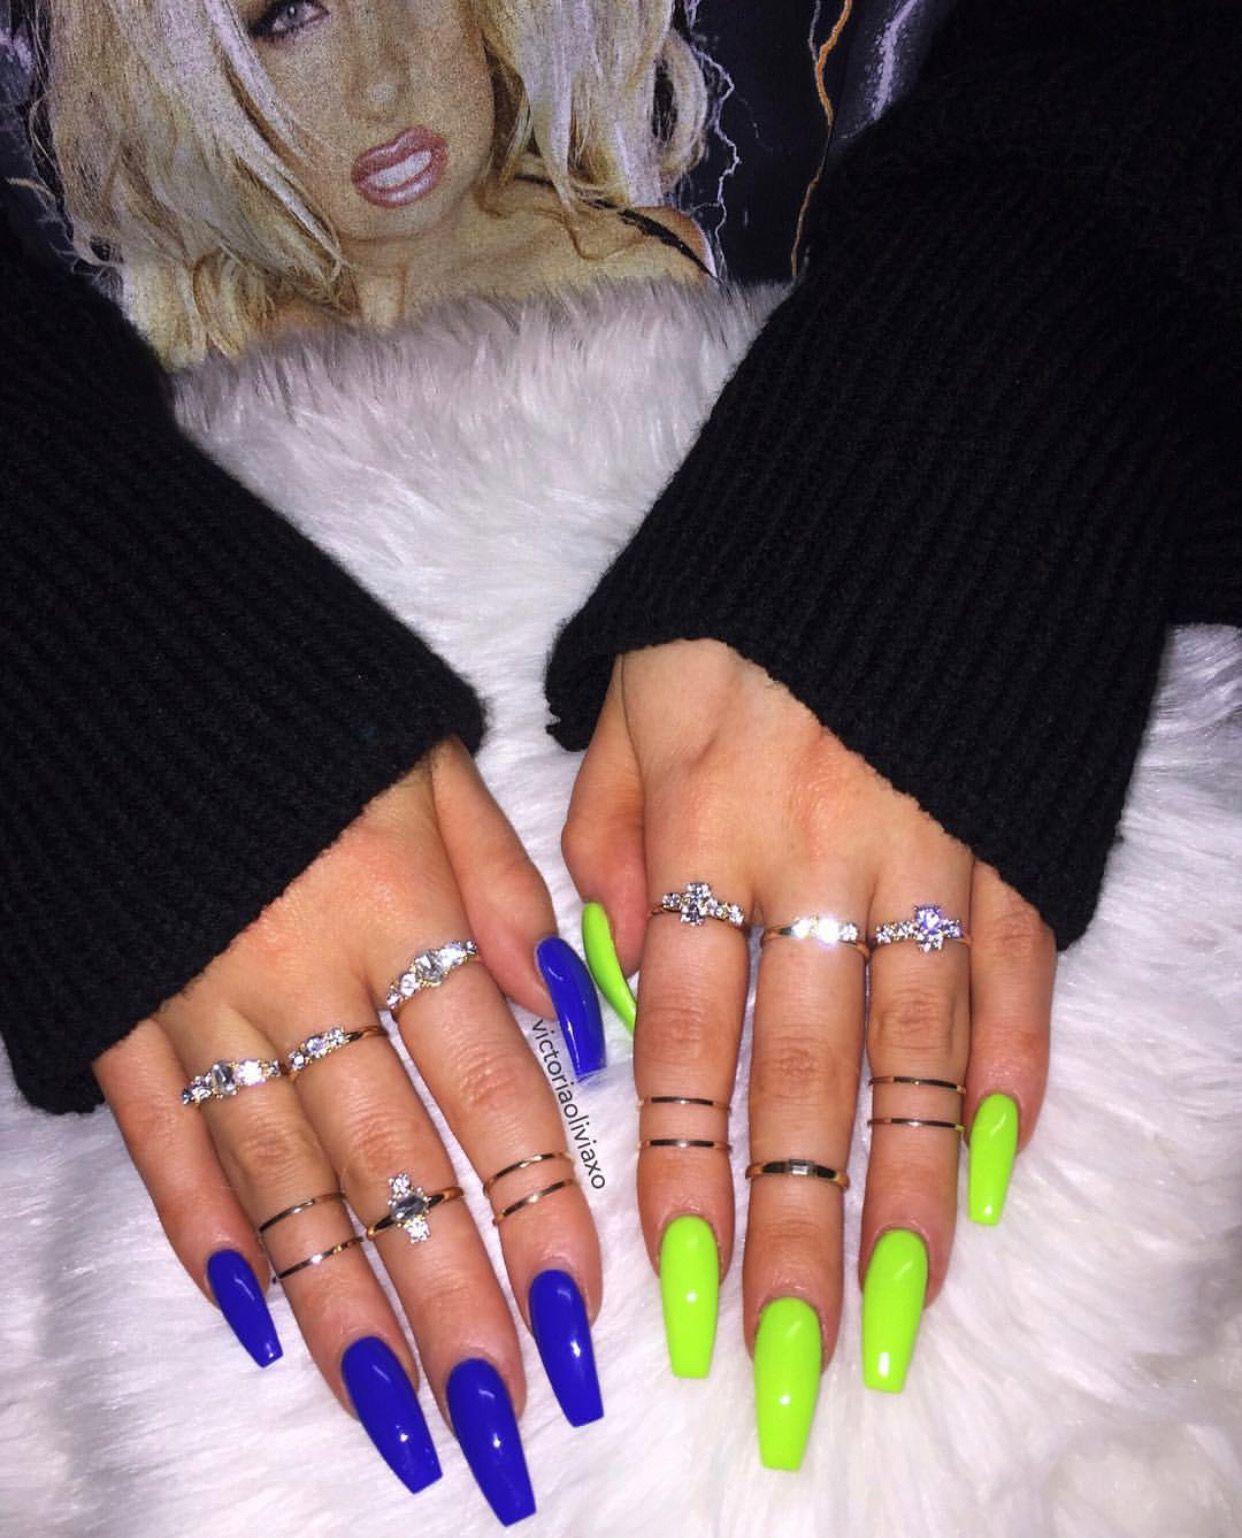 Pinterest Lilsadbaddie Neon Acrylic Nails Blue Acrylic Nails Acrylic Nails